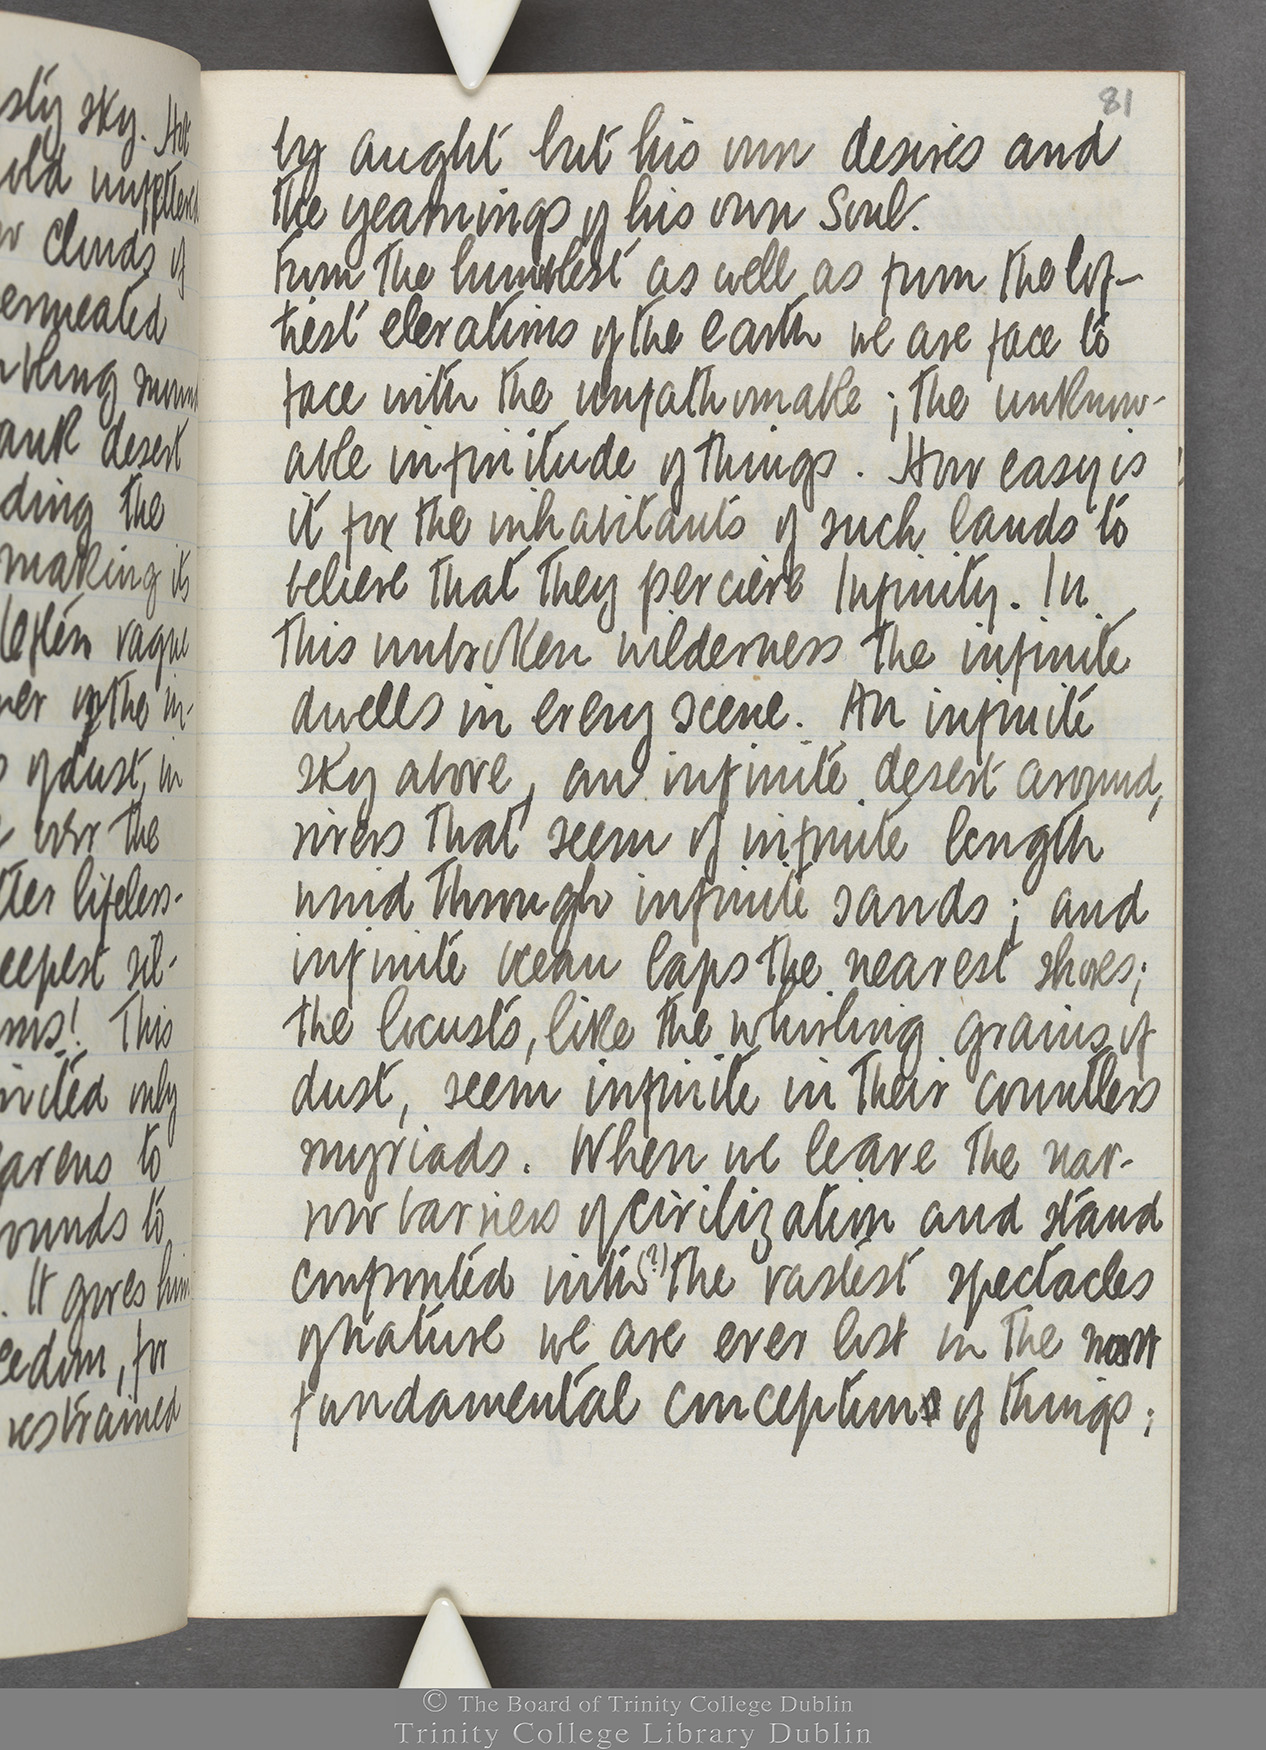 TCD MS 10515 folio 81 recto